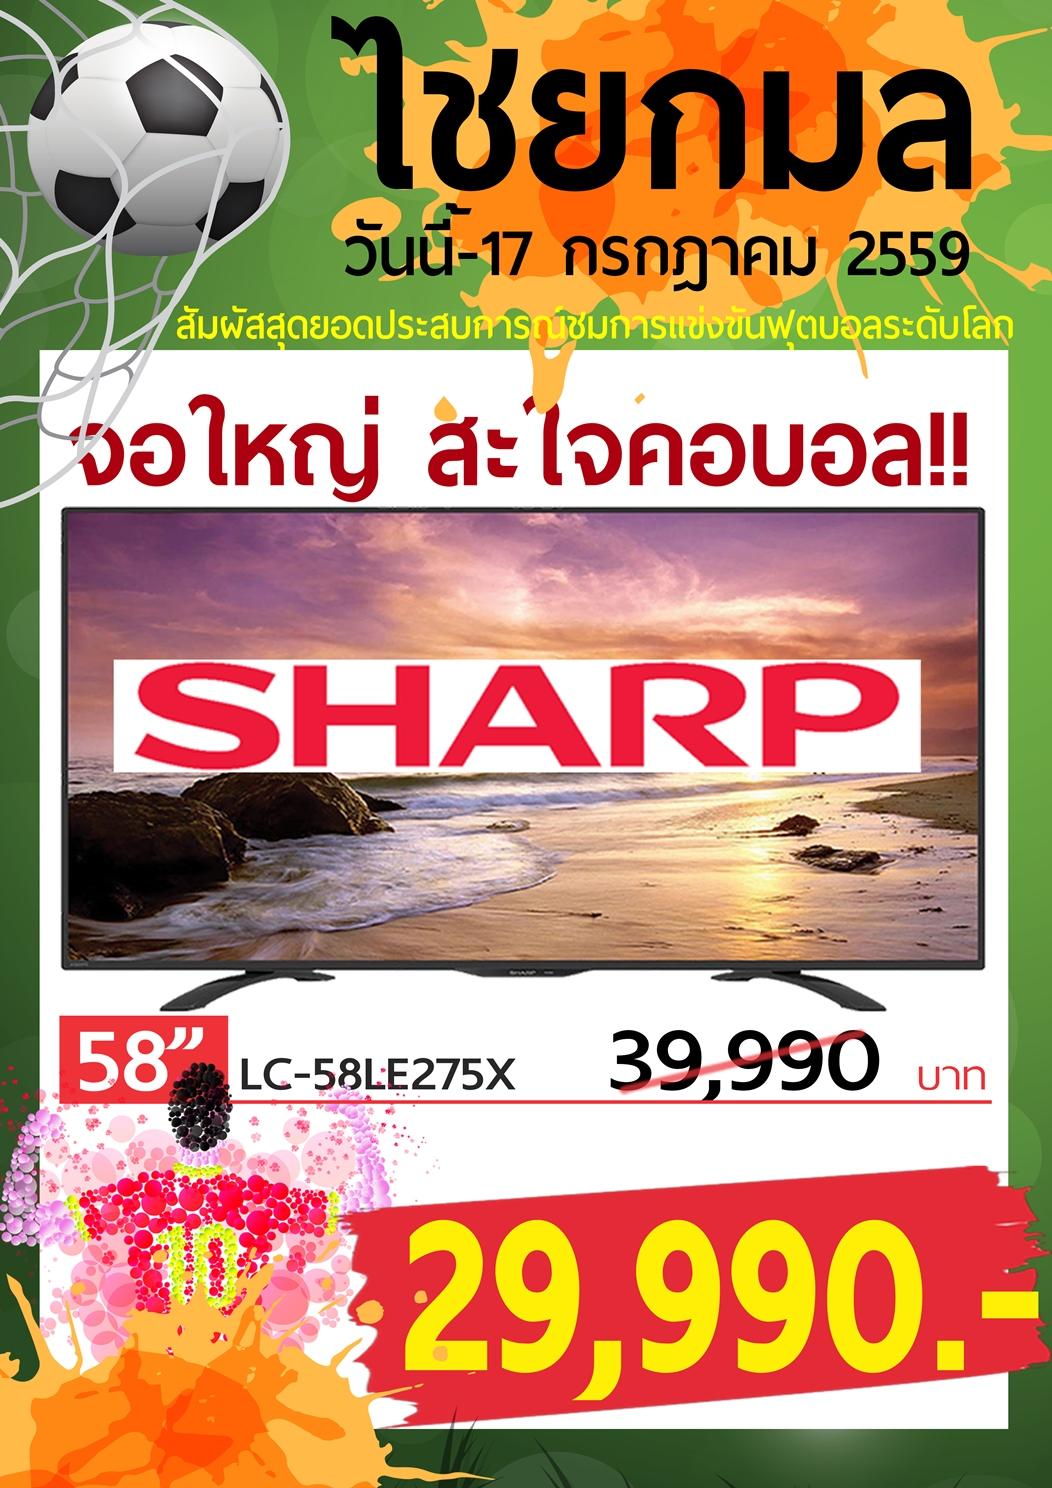 TV Sharp AQUOS LED ขนาด 58 นิ้ว รุ่น DTV LC-58LE275X